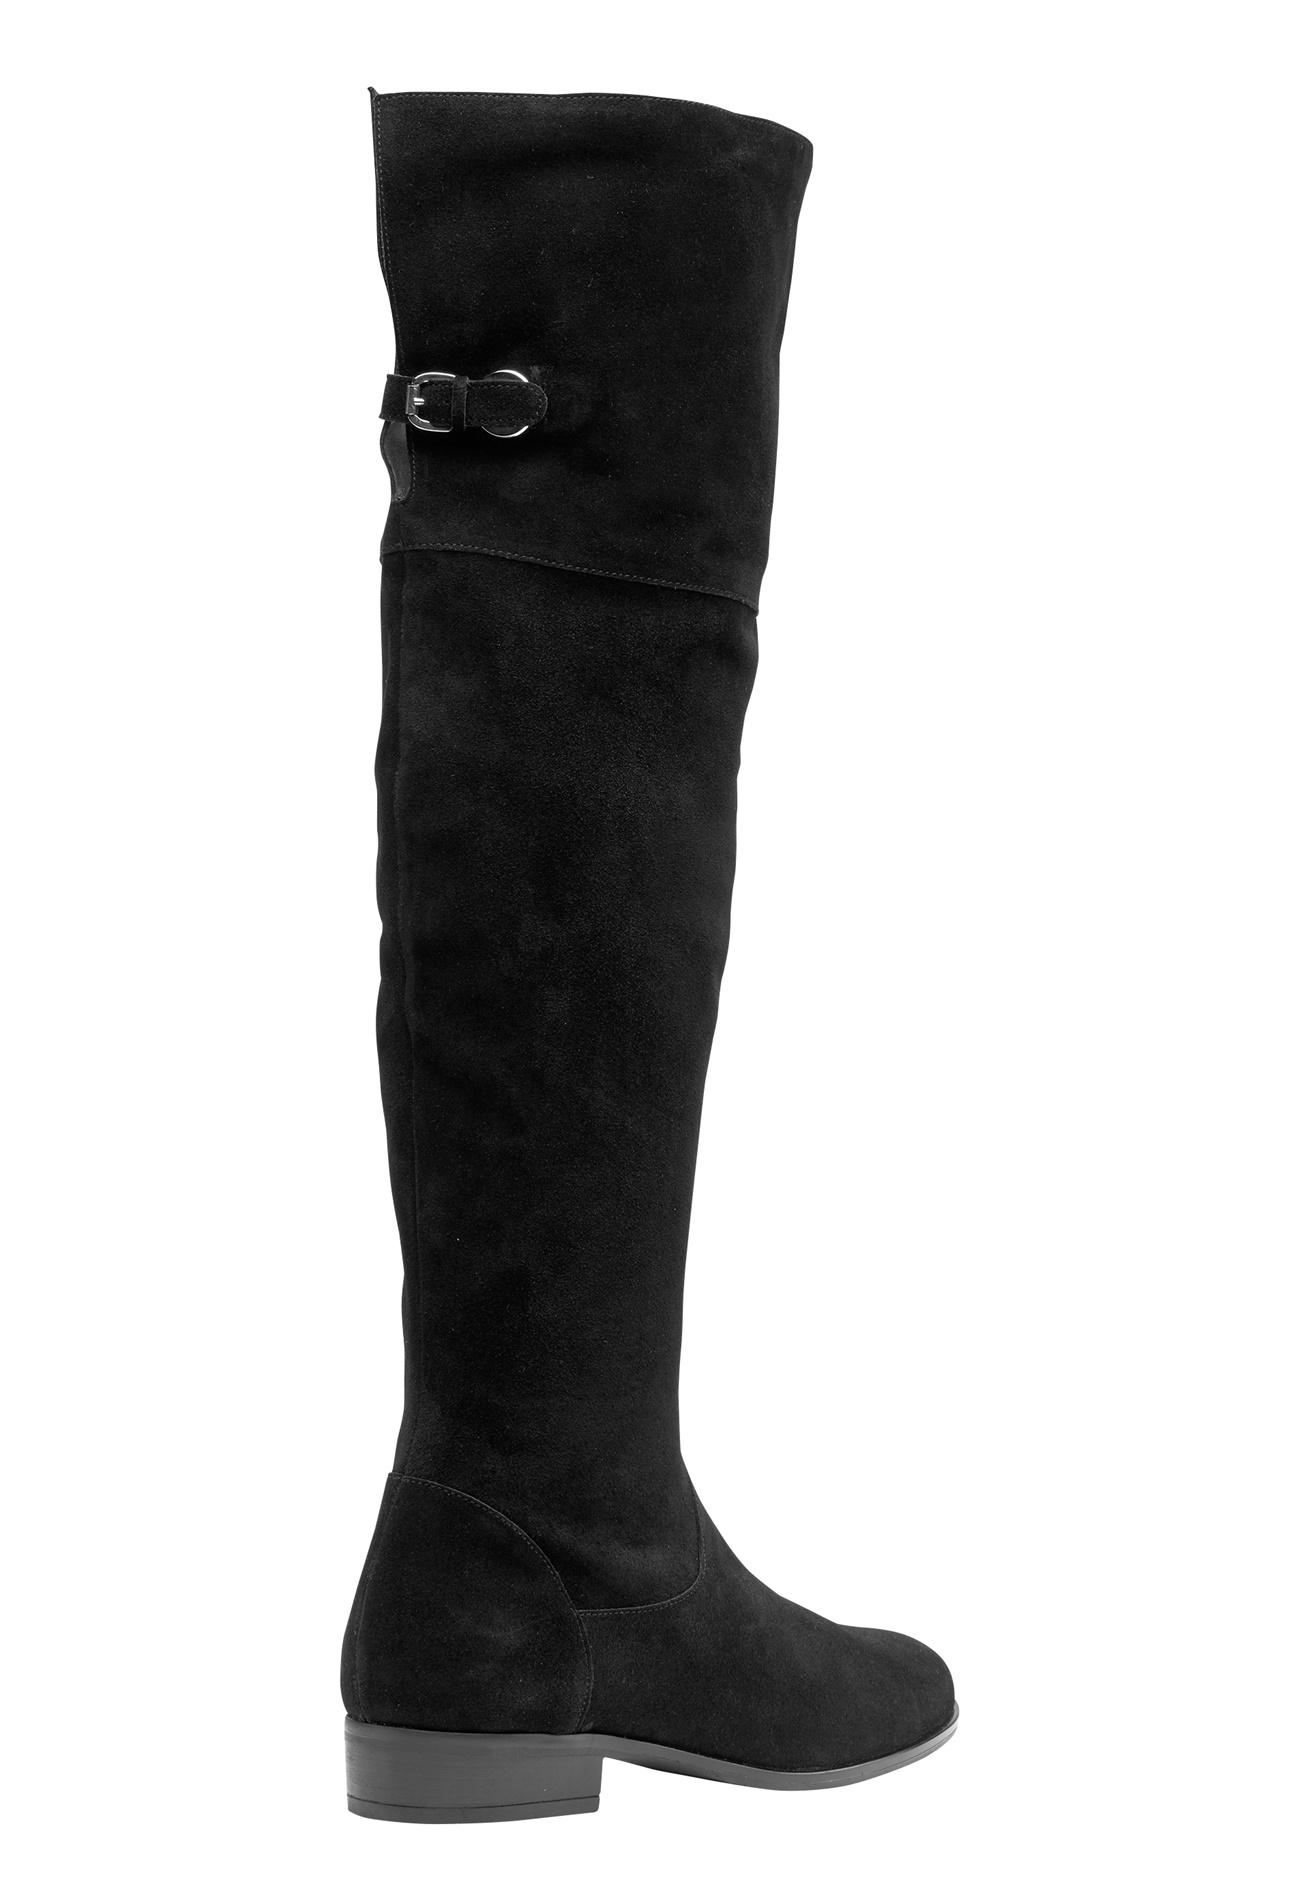 vero moda mille leather overknee black bubbleroom